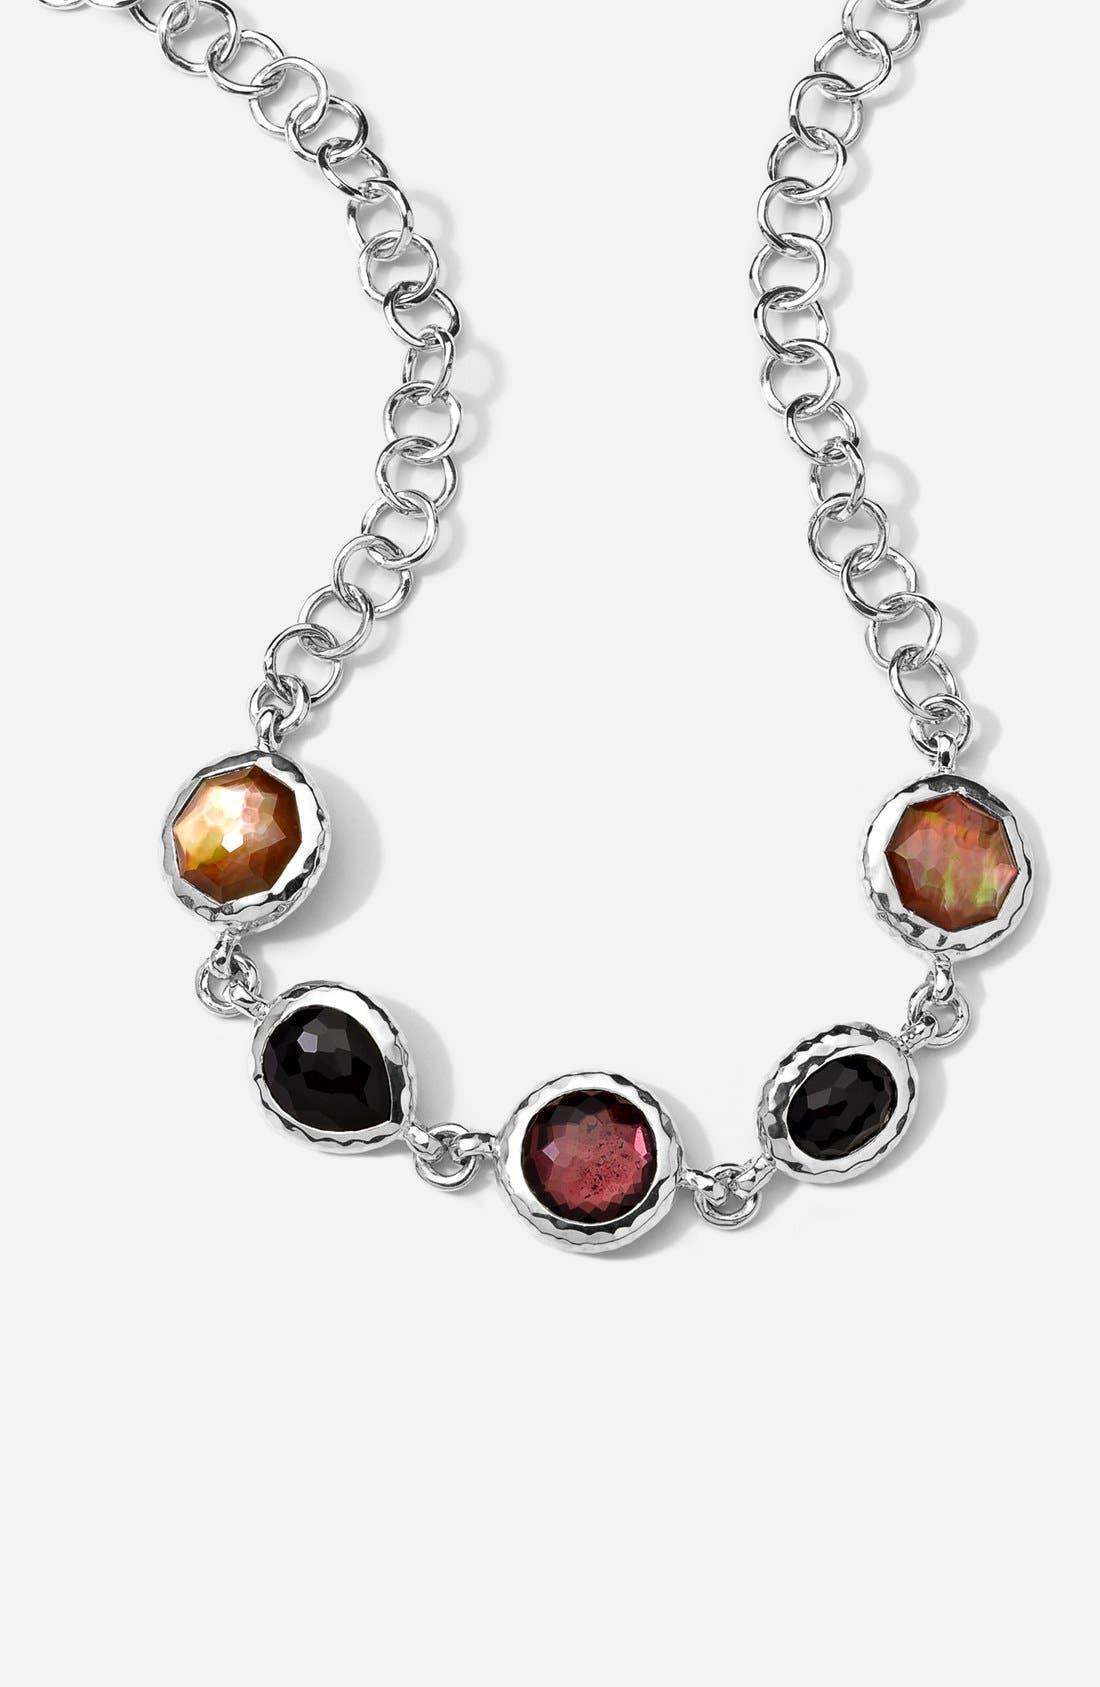 Alternate Image 1 Selected - Ippolita 'Wonderland' Collar Necklace (Nordstrom Exclusive)